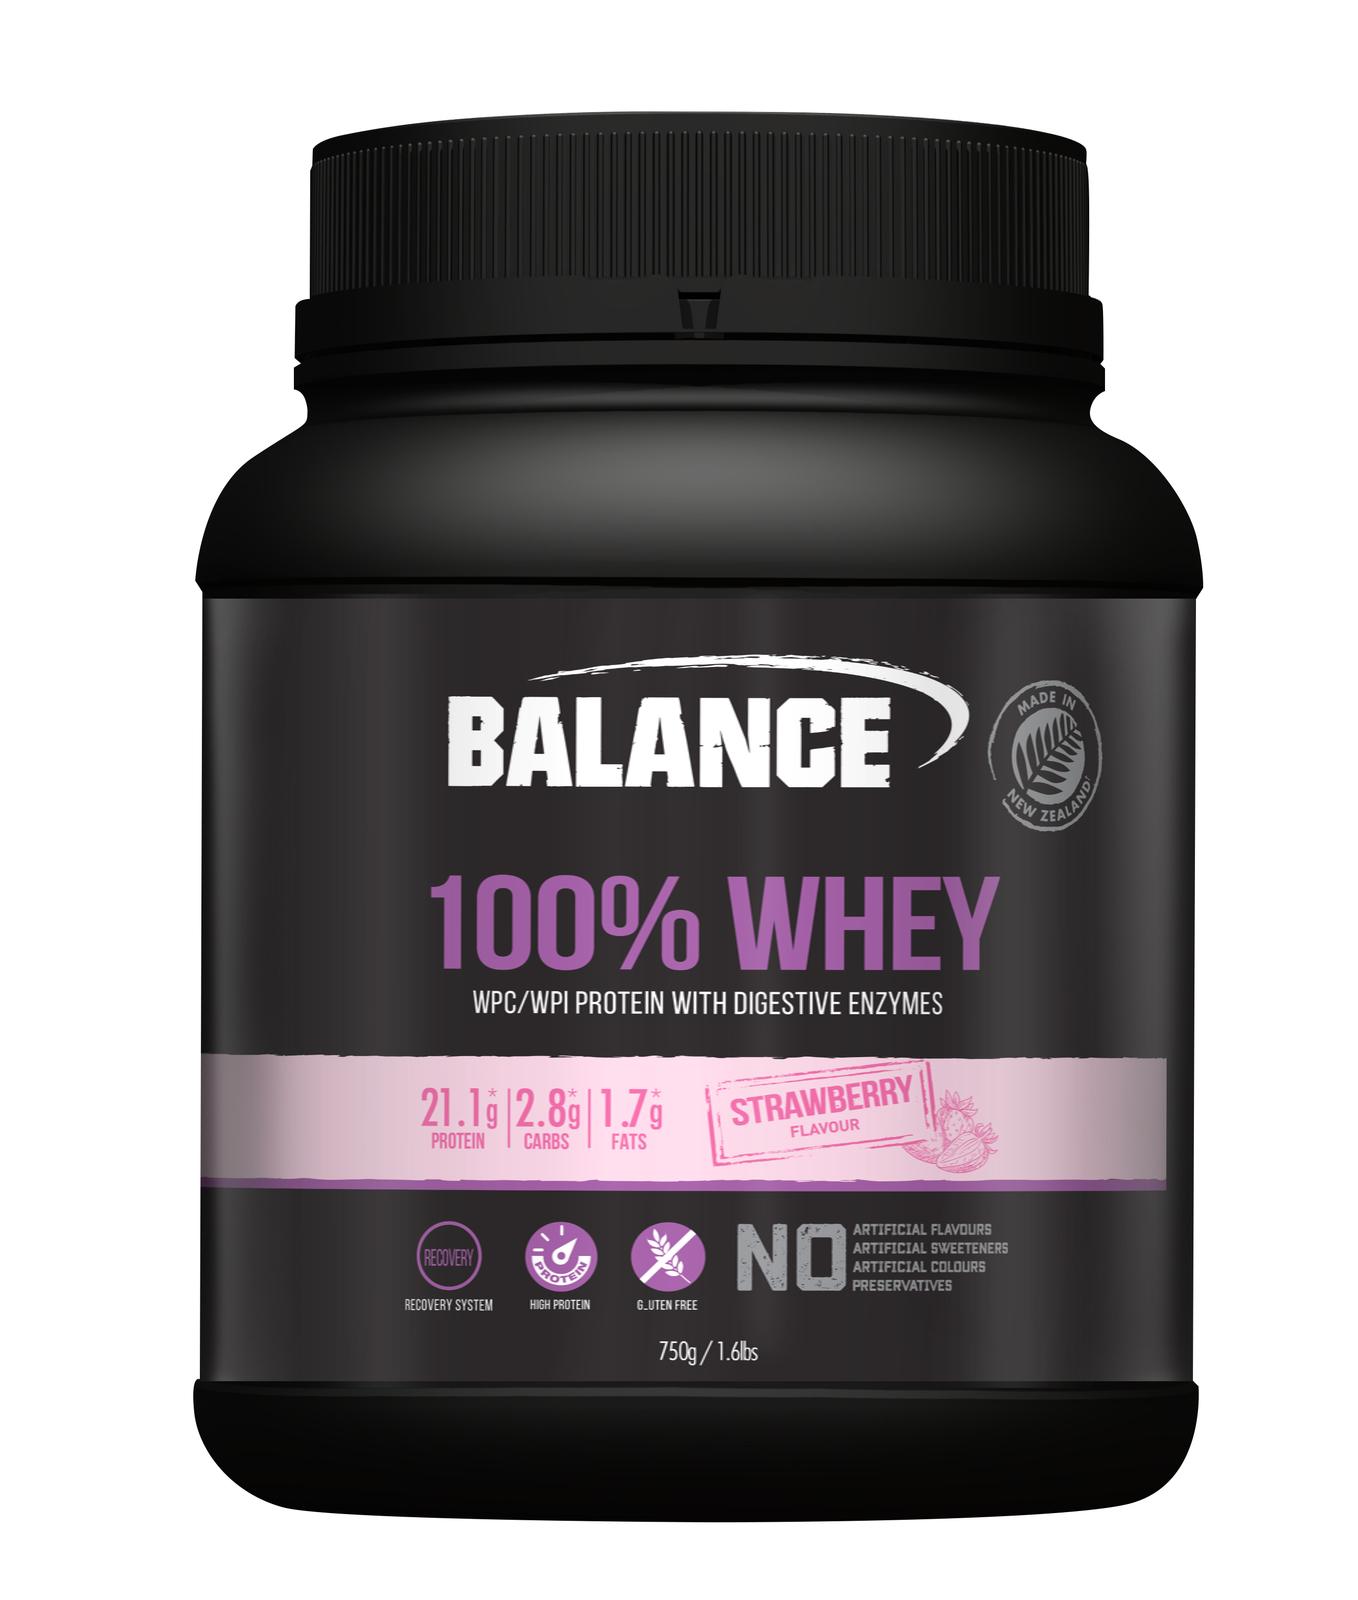 Balance 100% Whey Protein Powder - Strawberry (750g) image